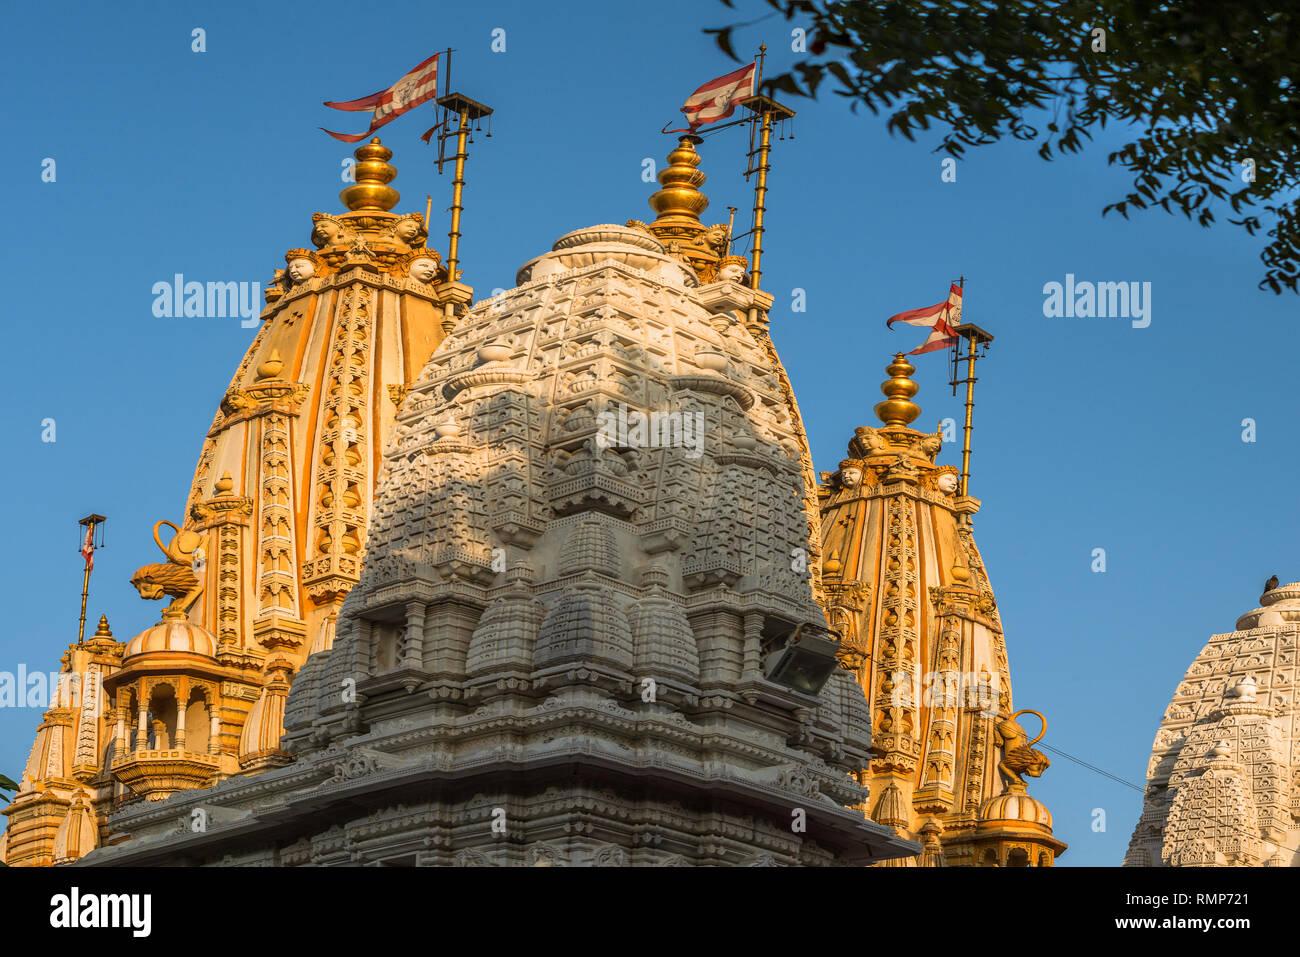 12-01-2017-three shikhara BAPS Shri Swaminarayan Mandir Shahibaug Road, Ahmedabad, Gujarat INDIA - Stock Image